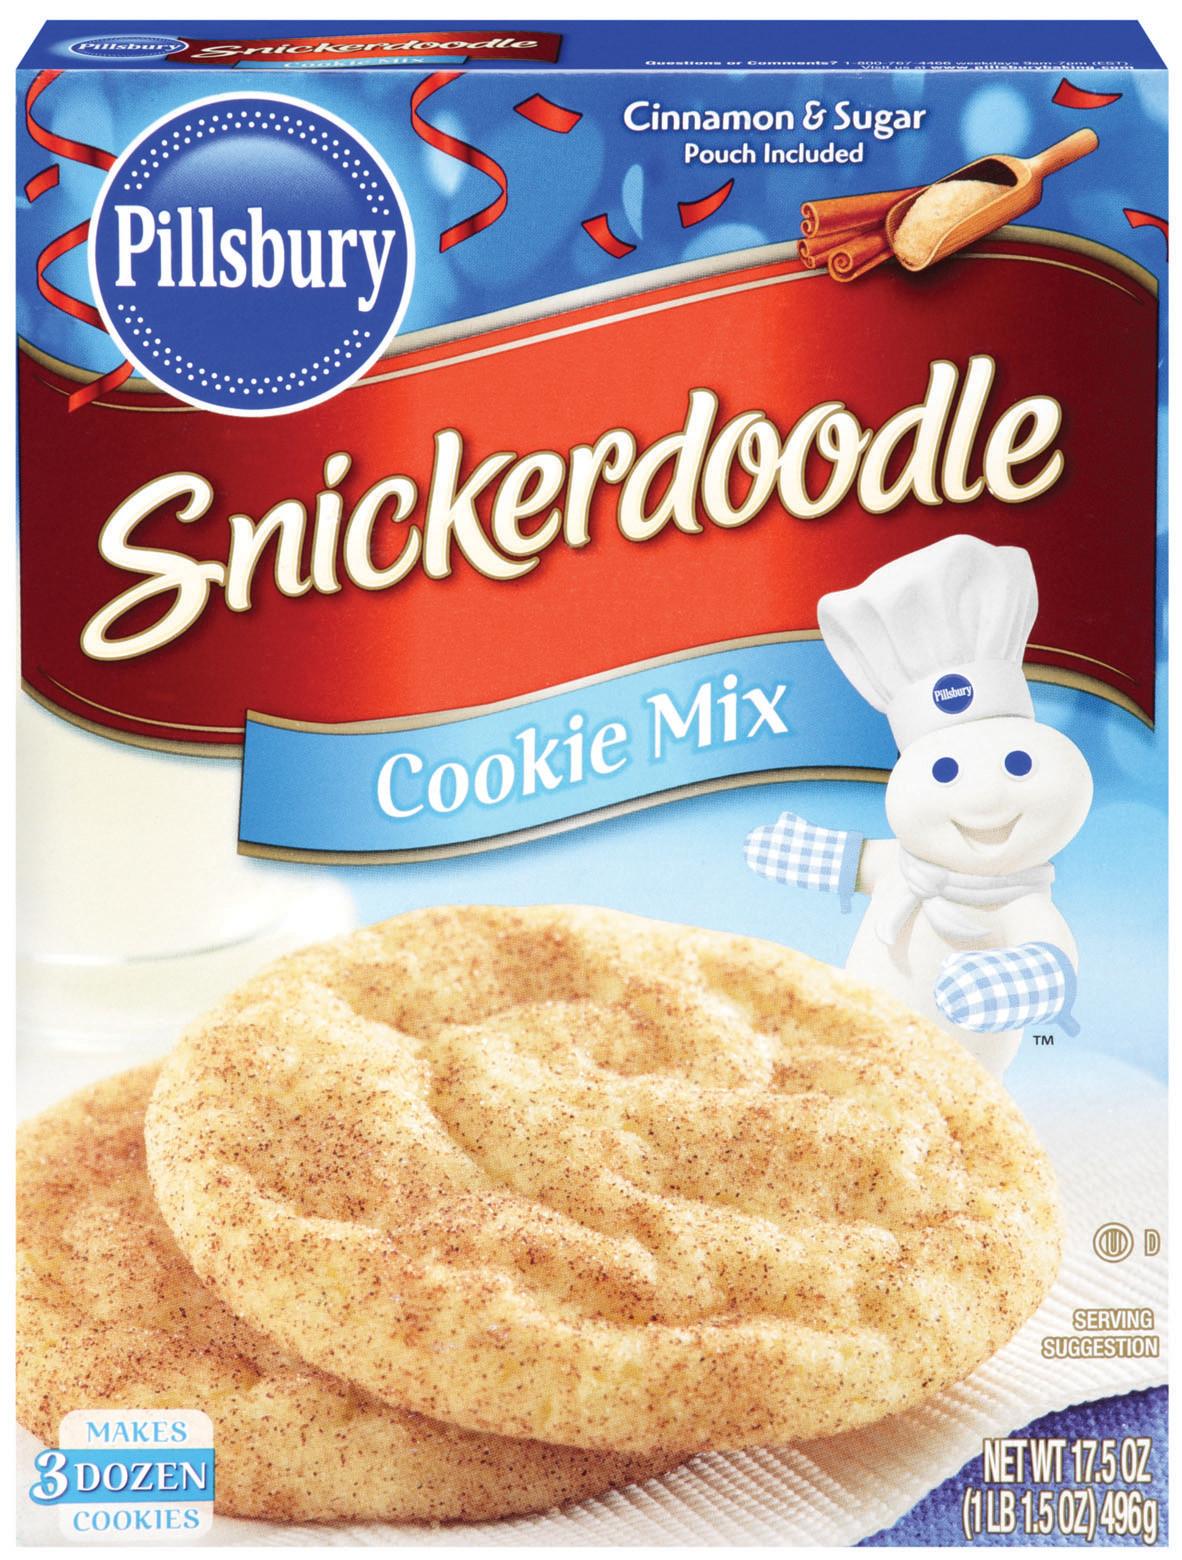 Pillsbury Halloween Cookies Walmart  Pillsbury Cookie Mix $ 29 at Tar